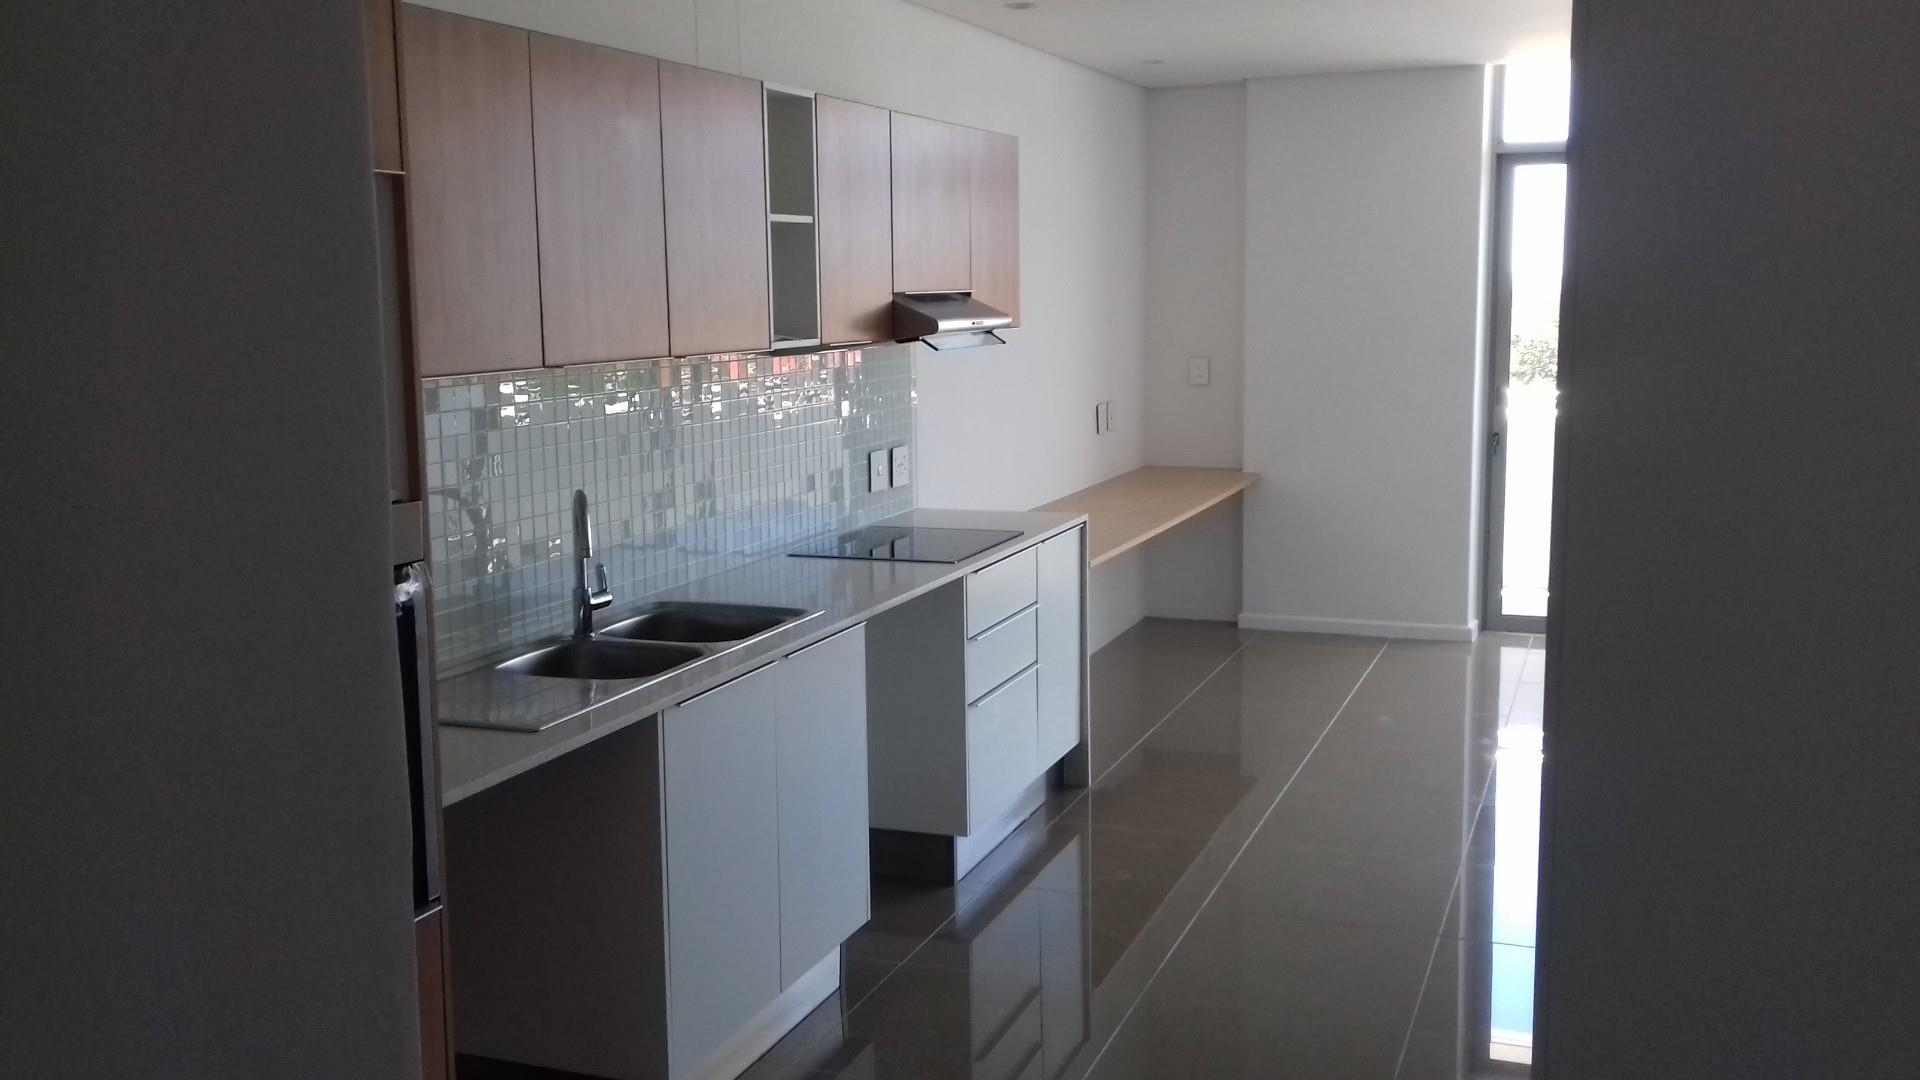 Bachelor Flat in Windhoek Central For Sale